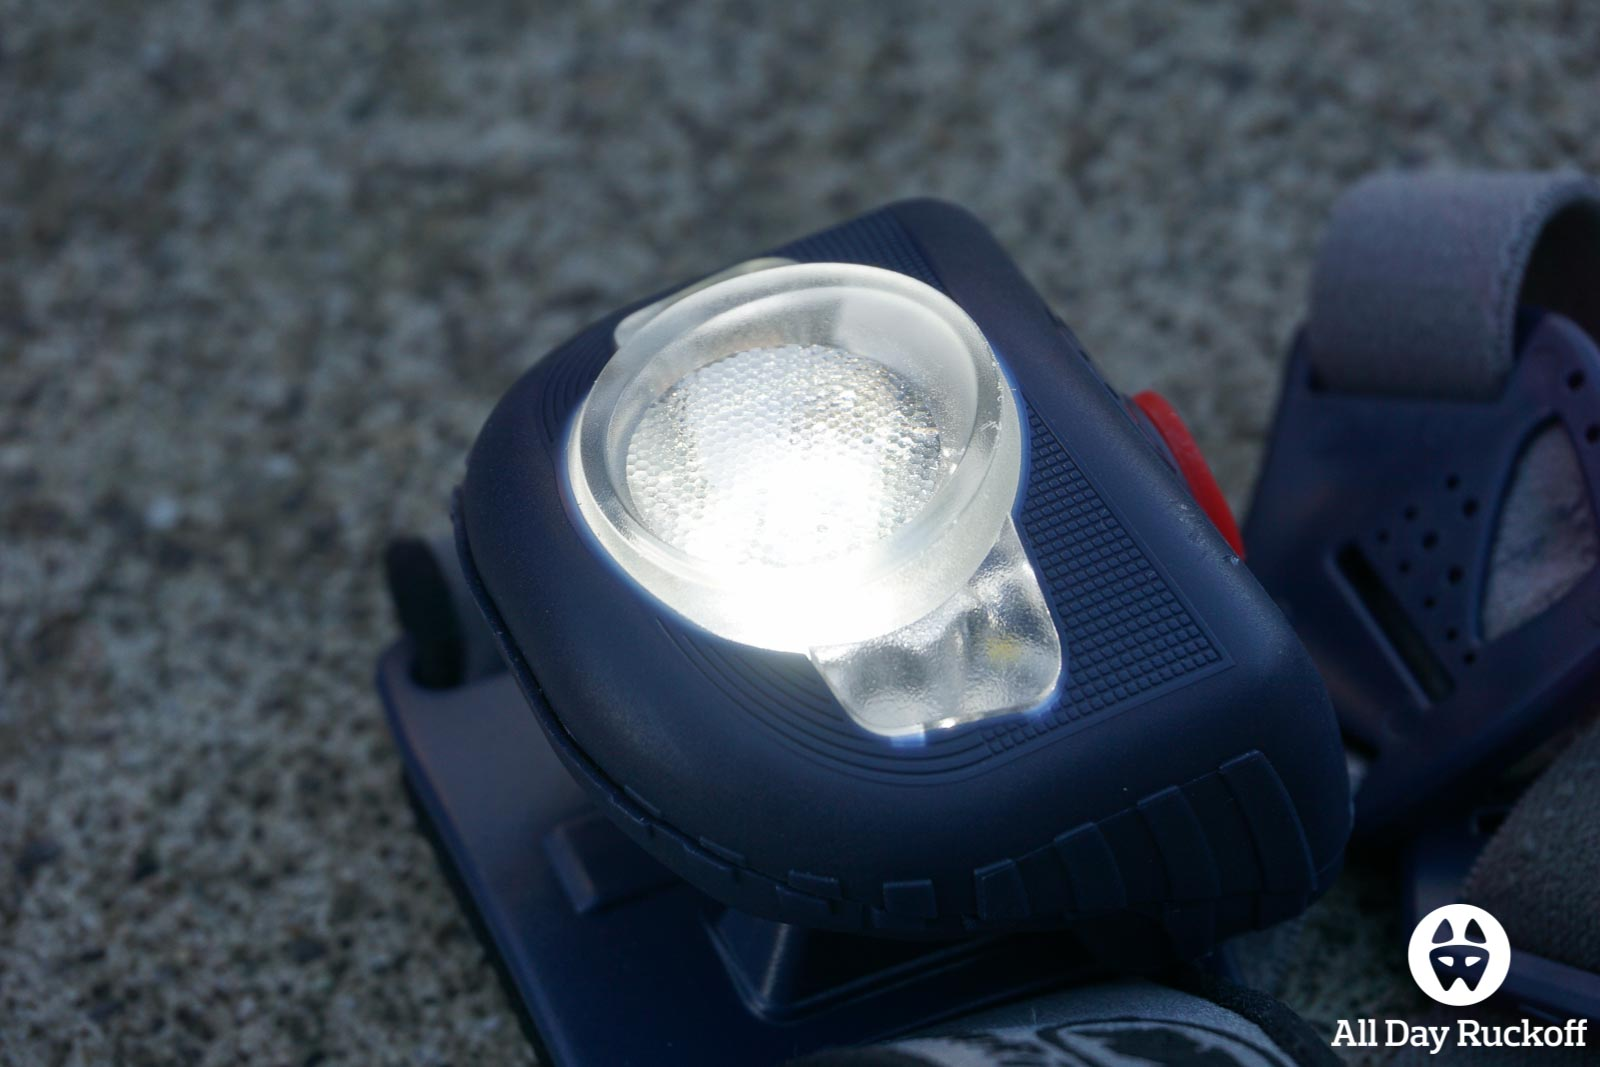 NiteRider Adventure 180 - White Light